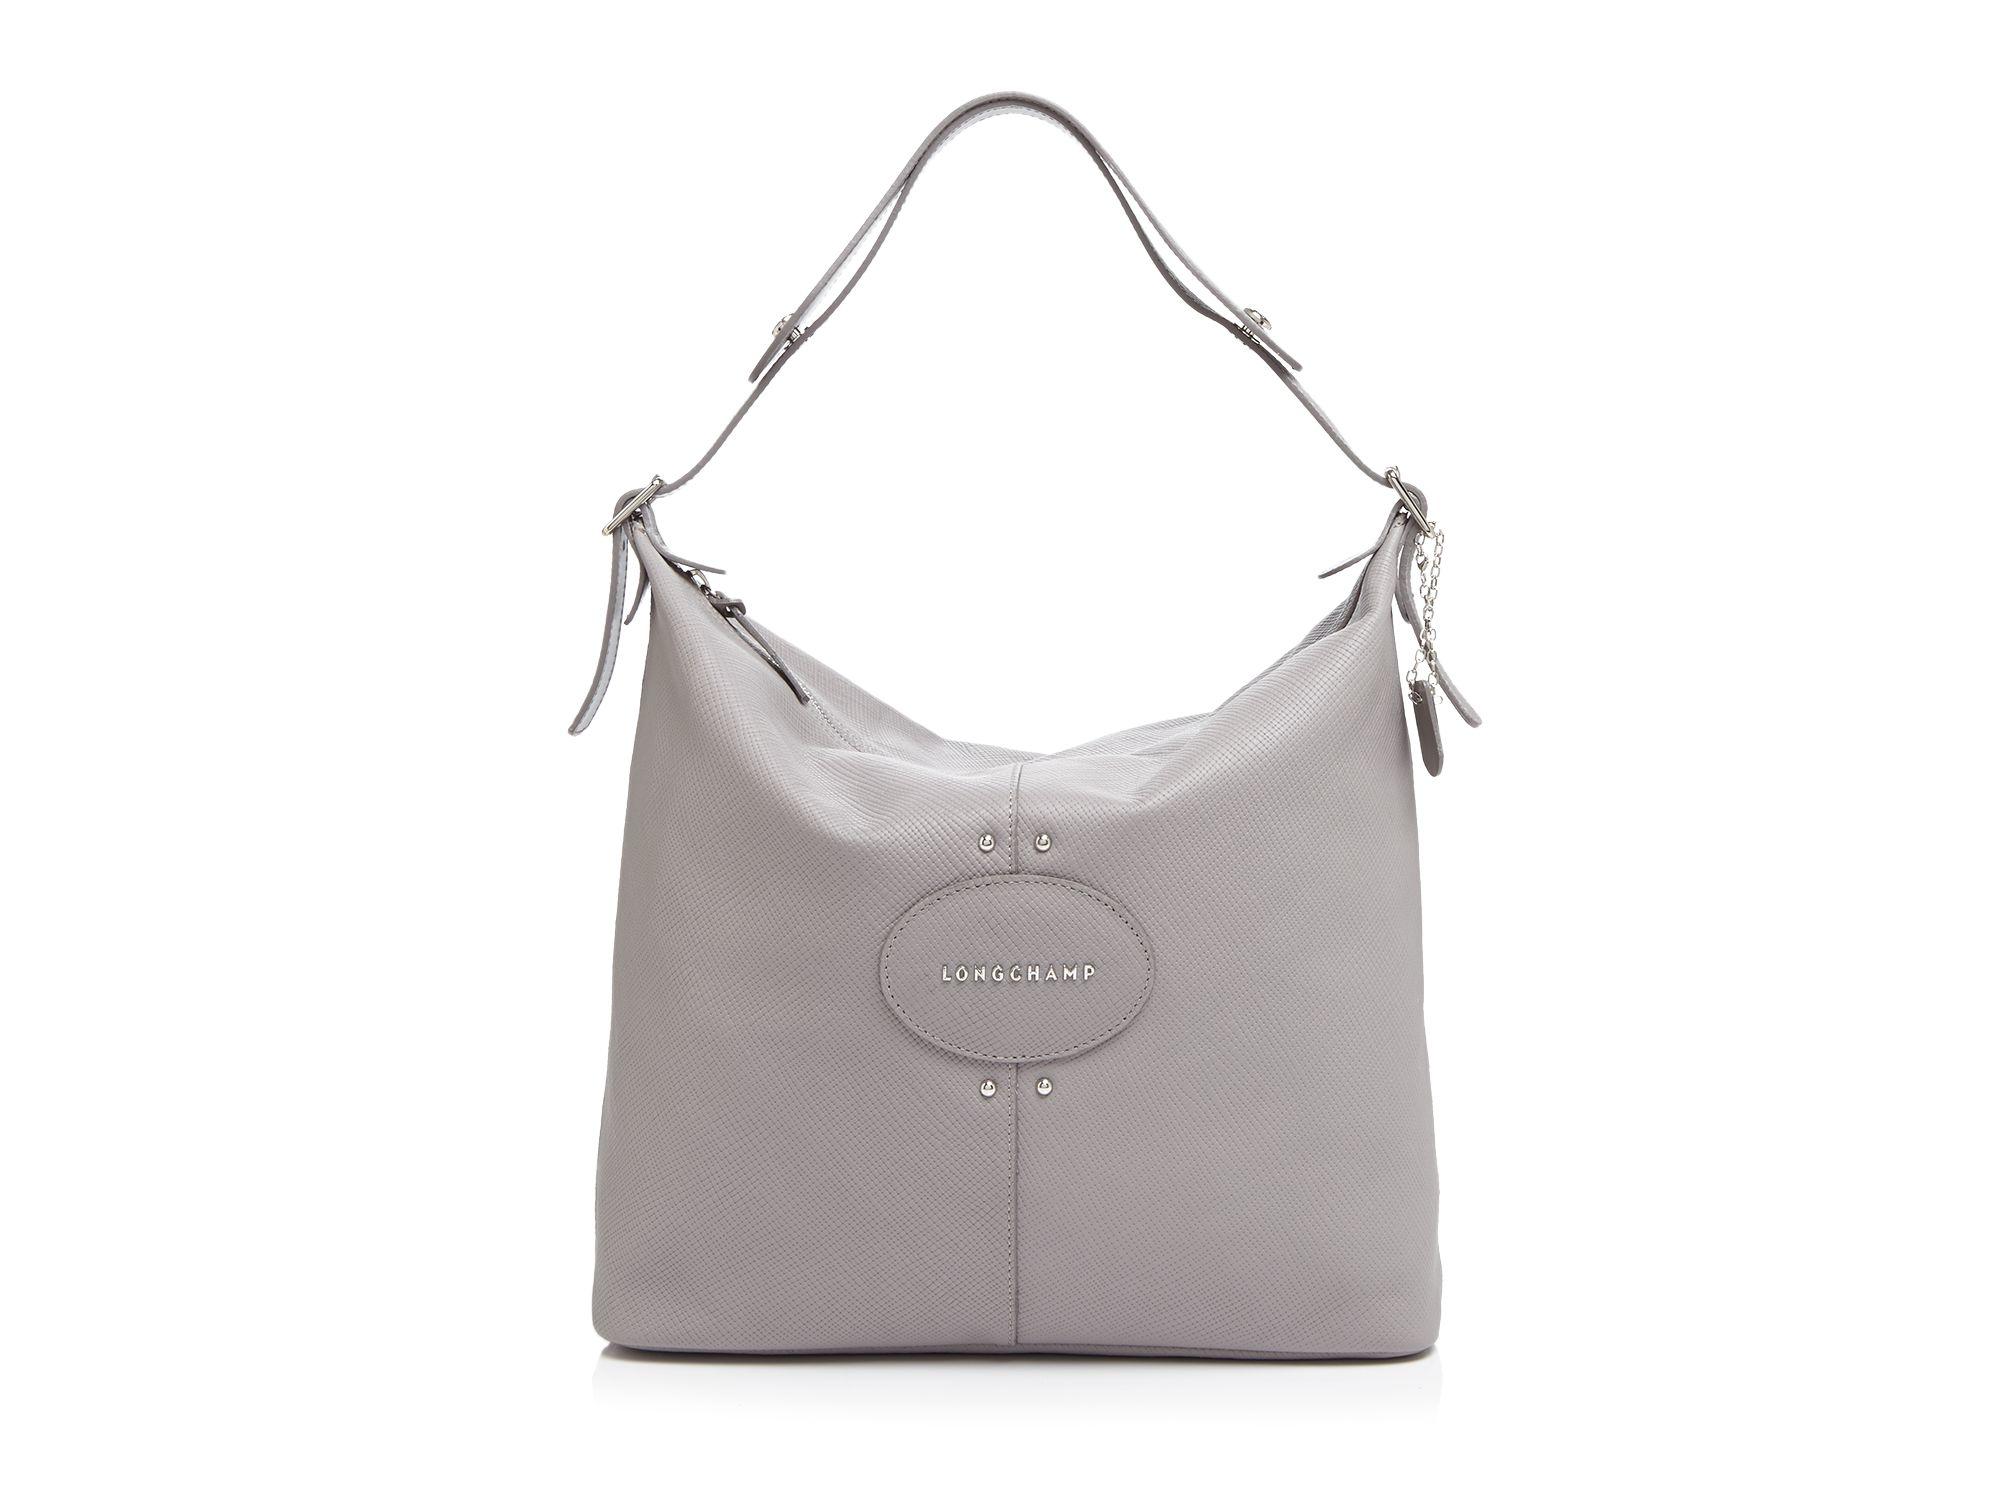 94e008955f96 Lyst - Longchamp Hobo - Quadri in Gray